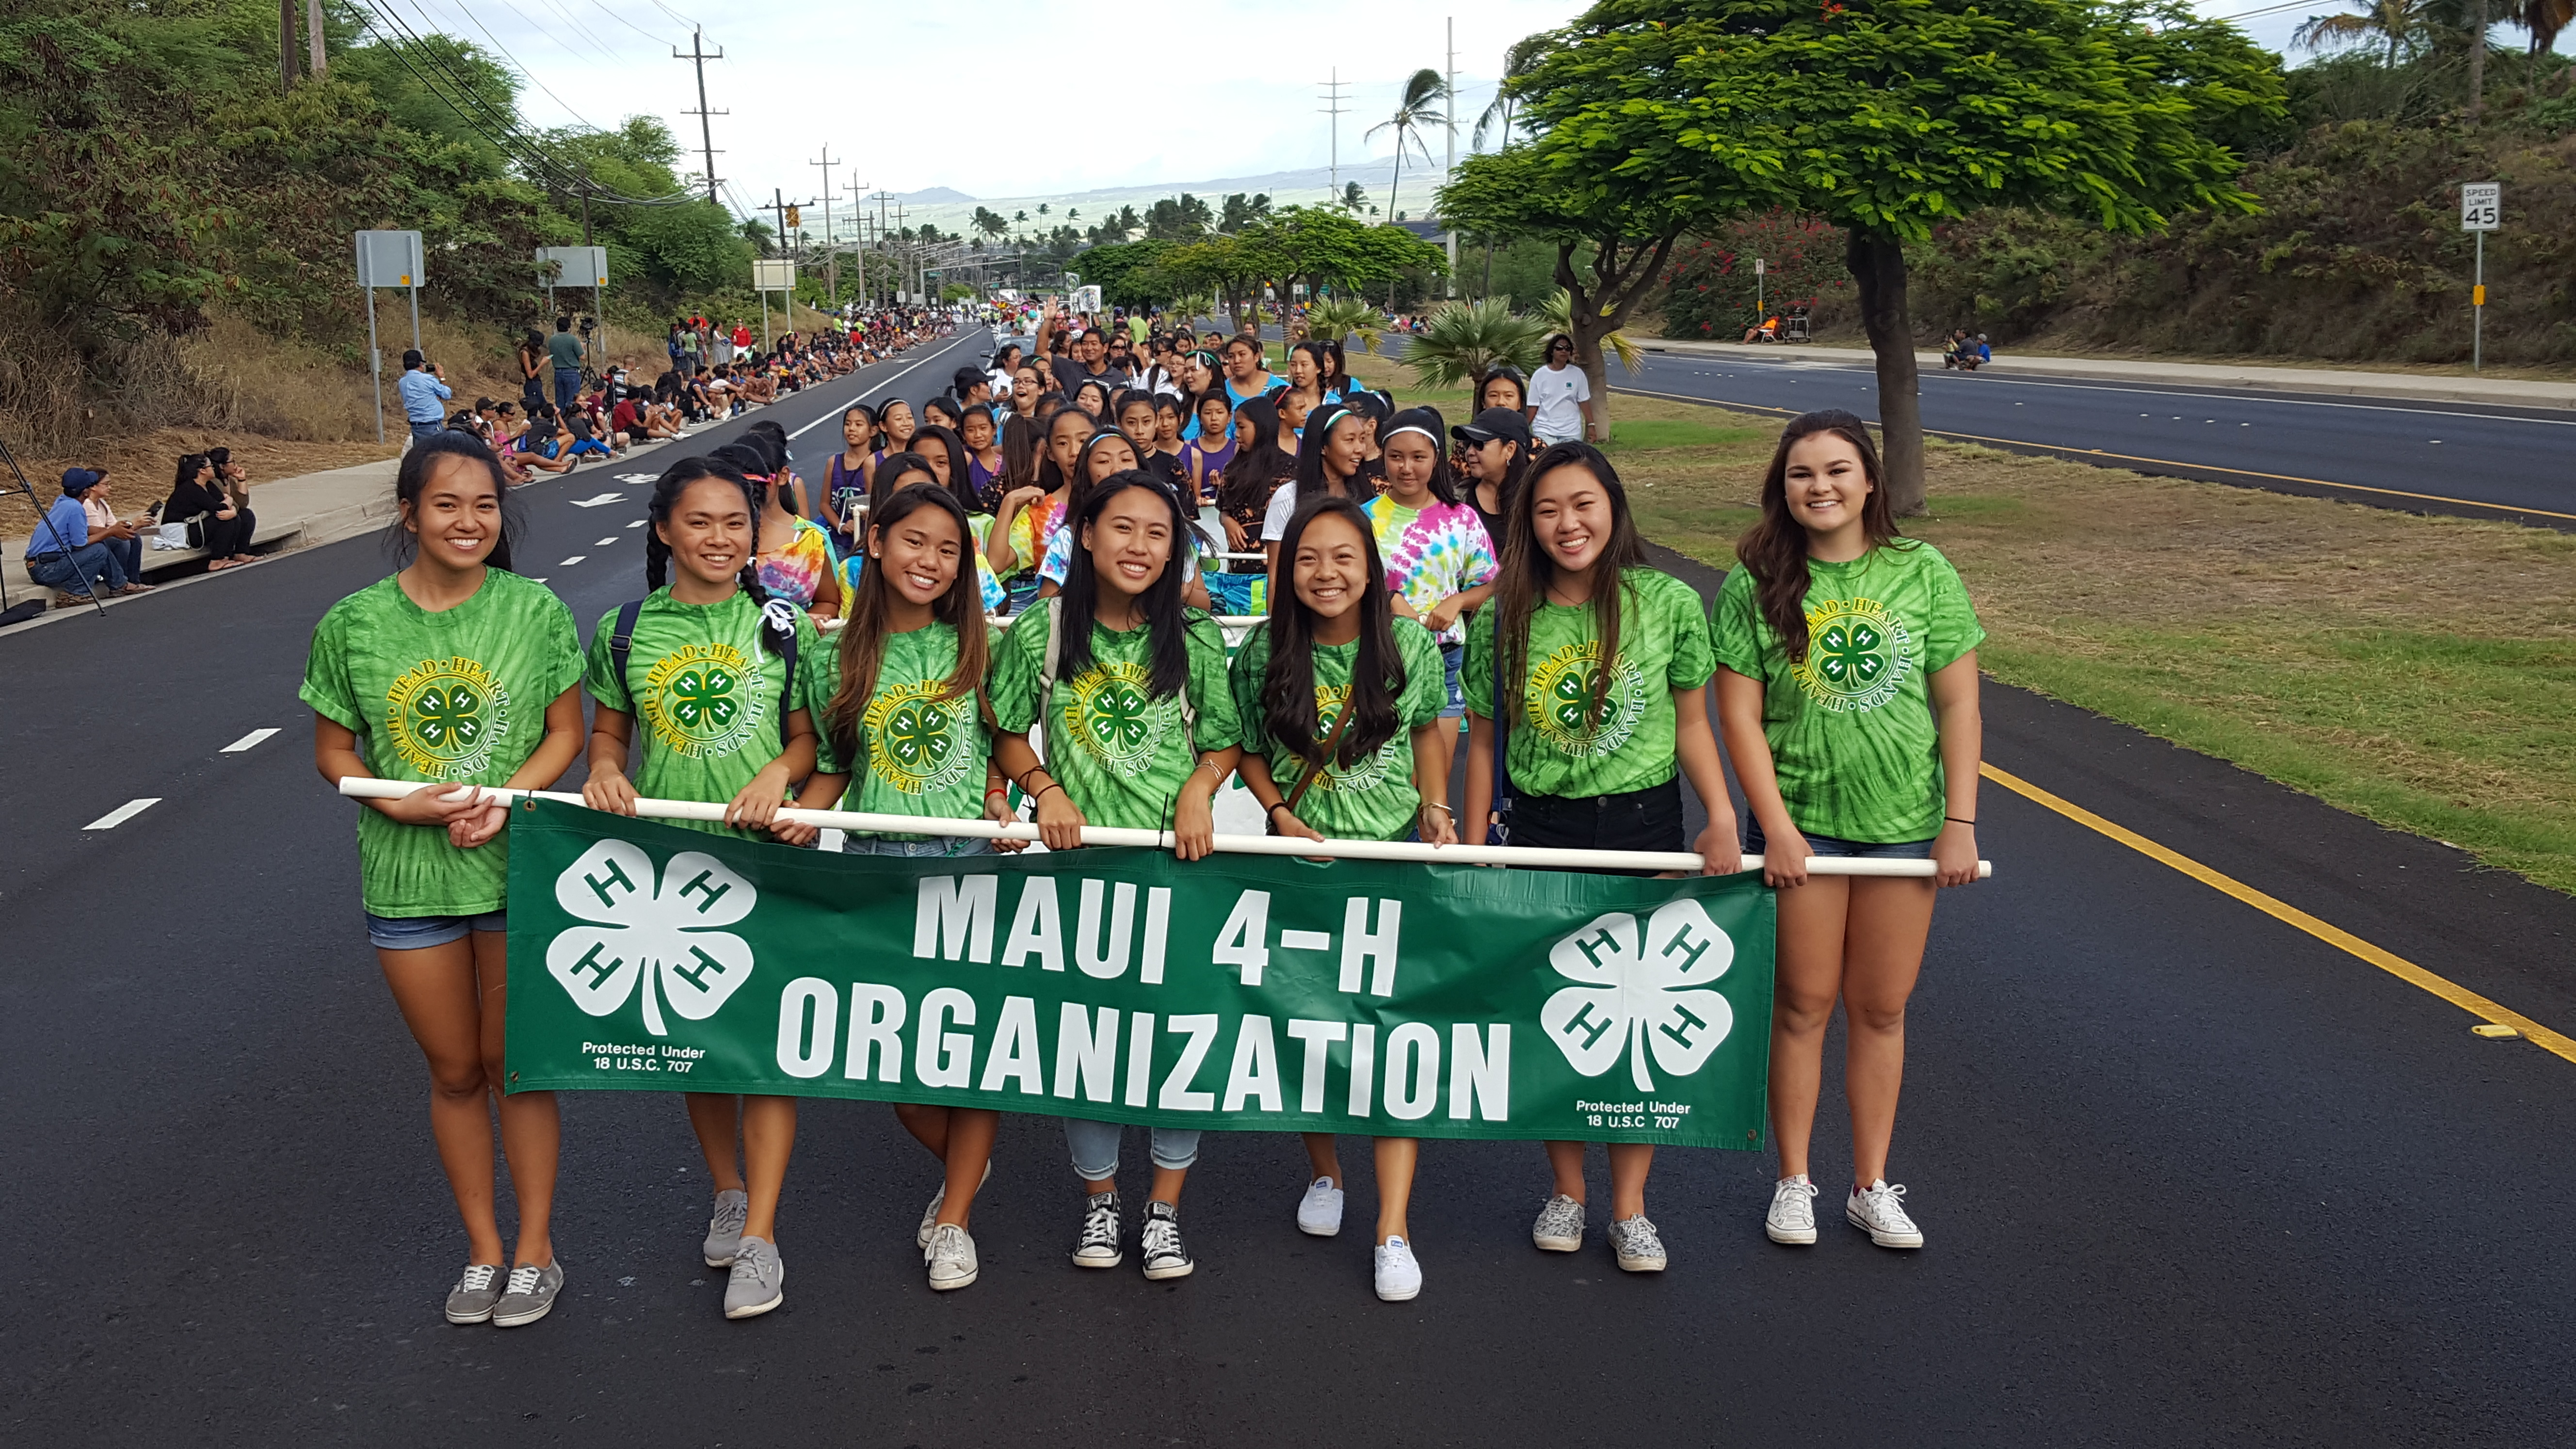 Maui 4-H Organization Parade Participants